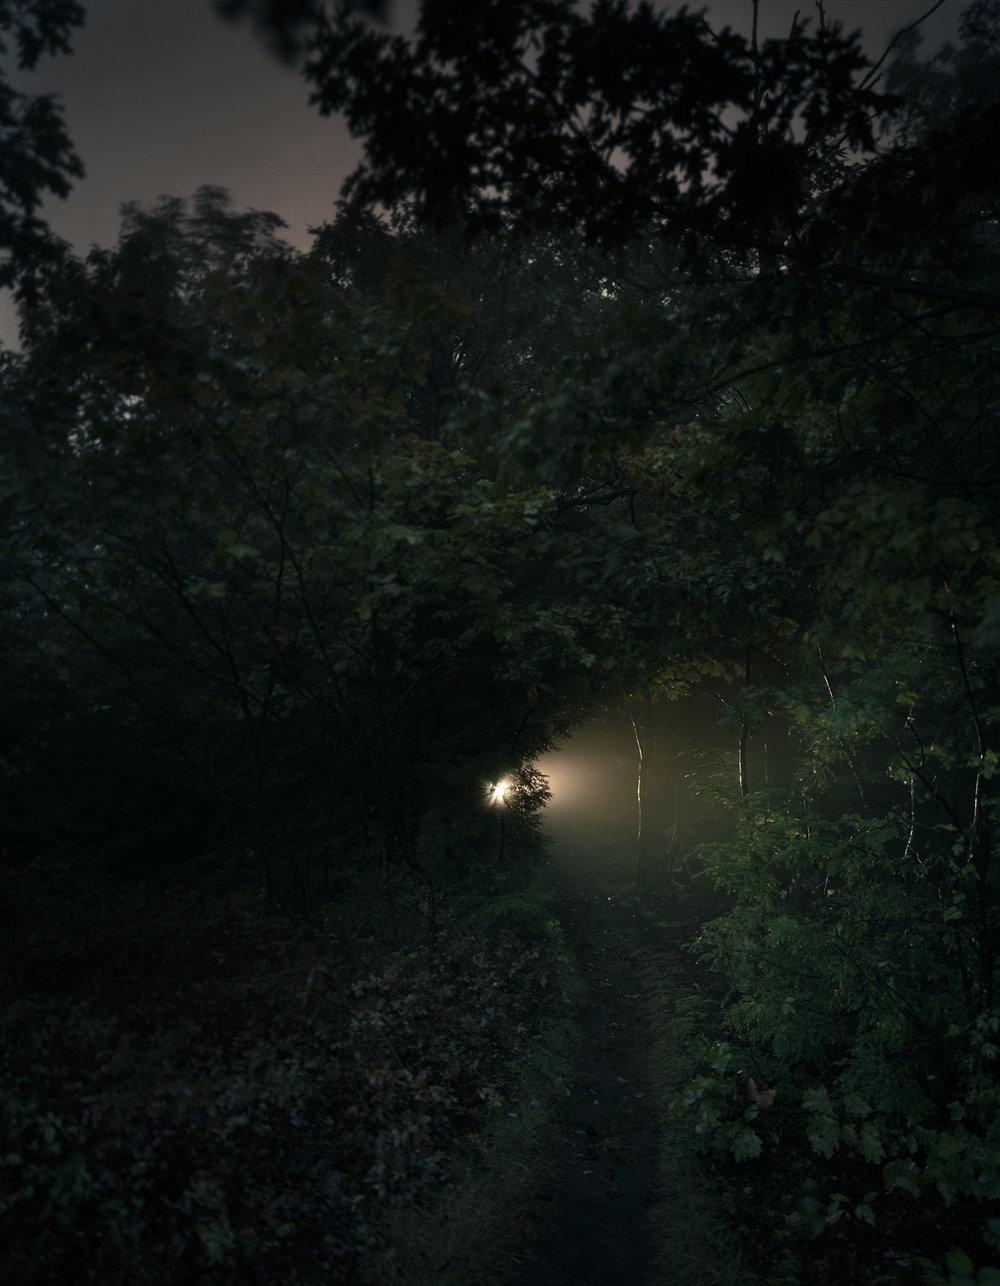 12-542 Beth with flashlight v3.jpg